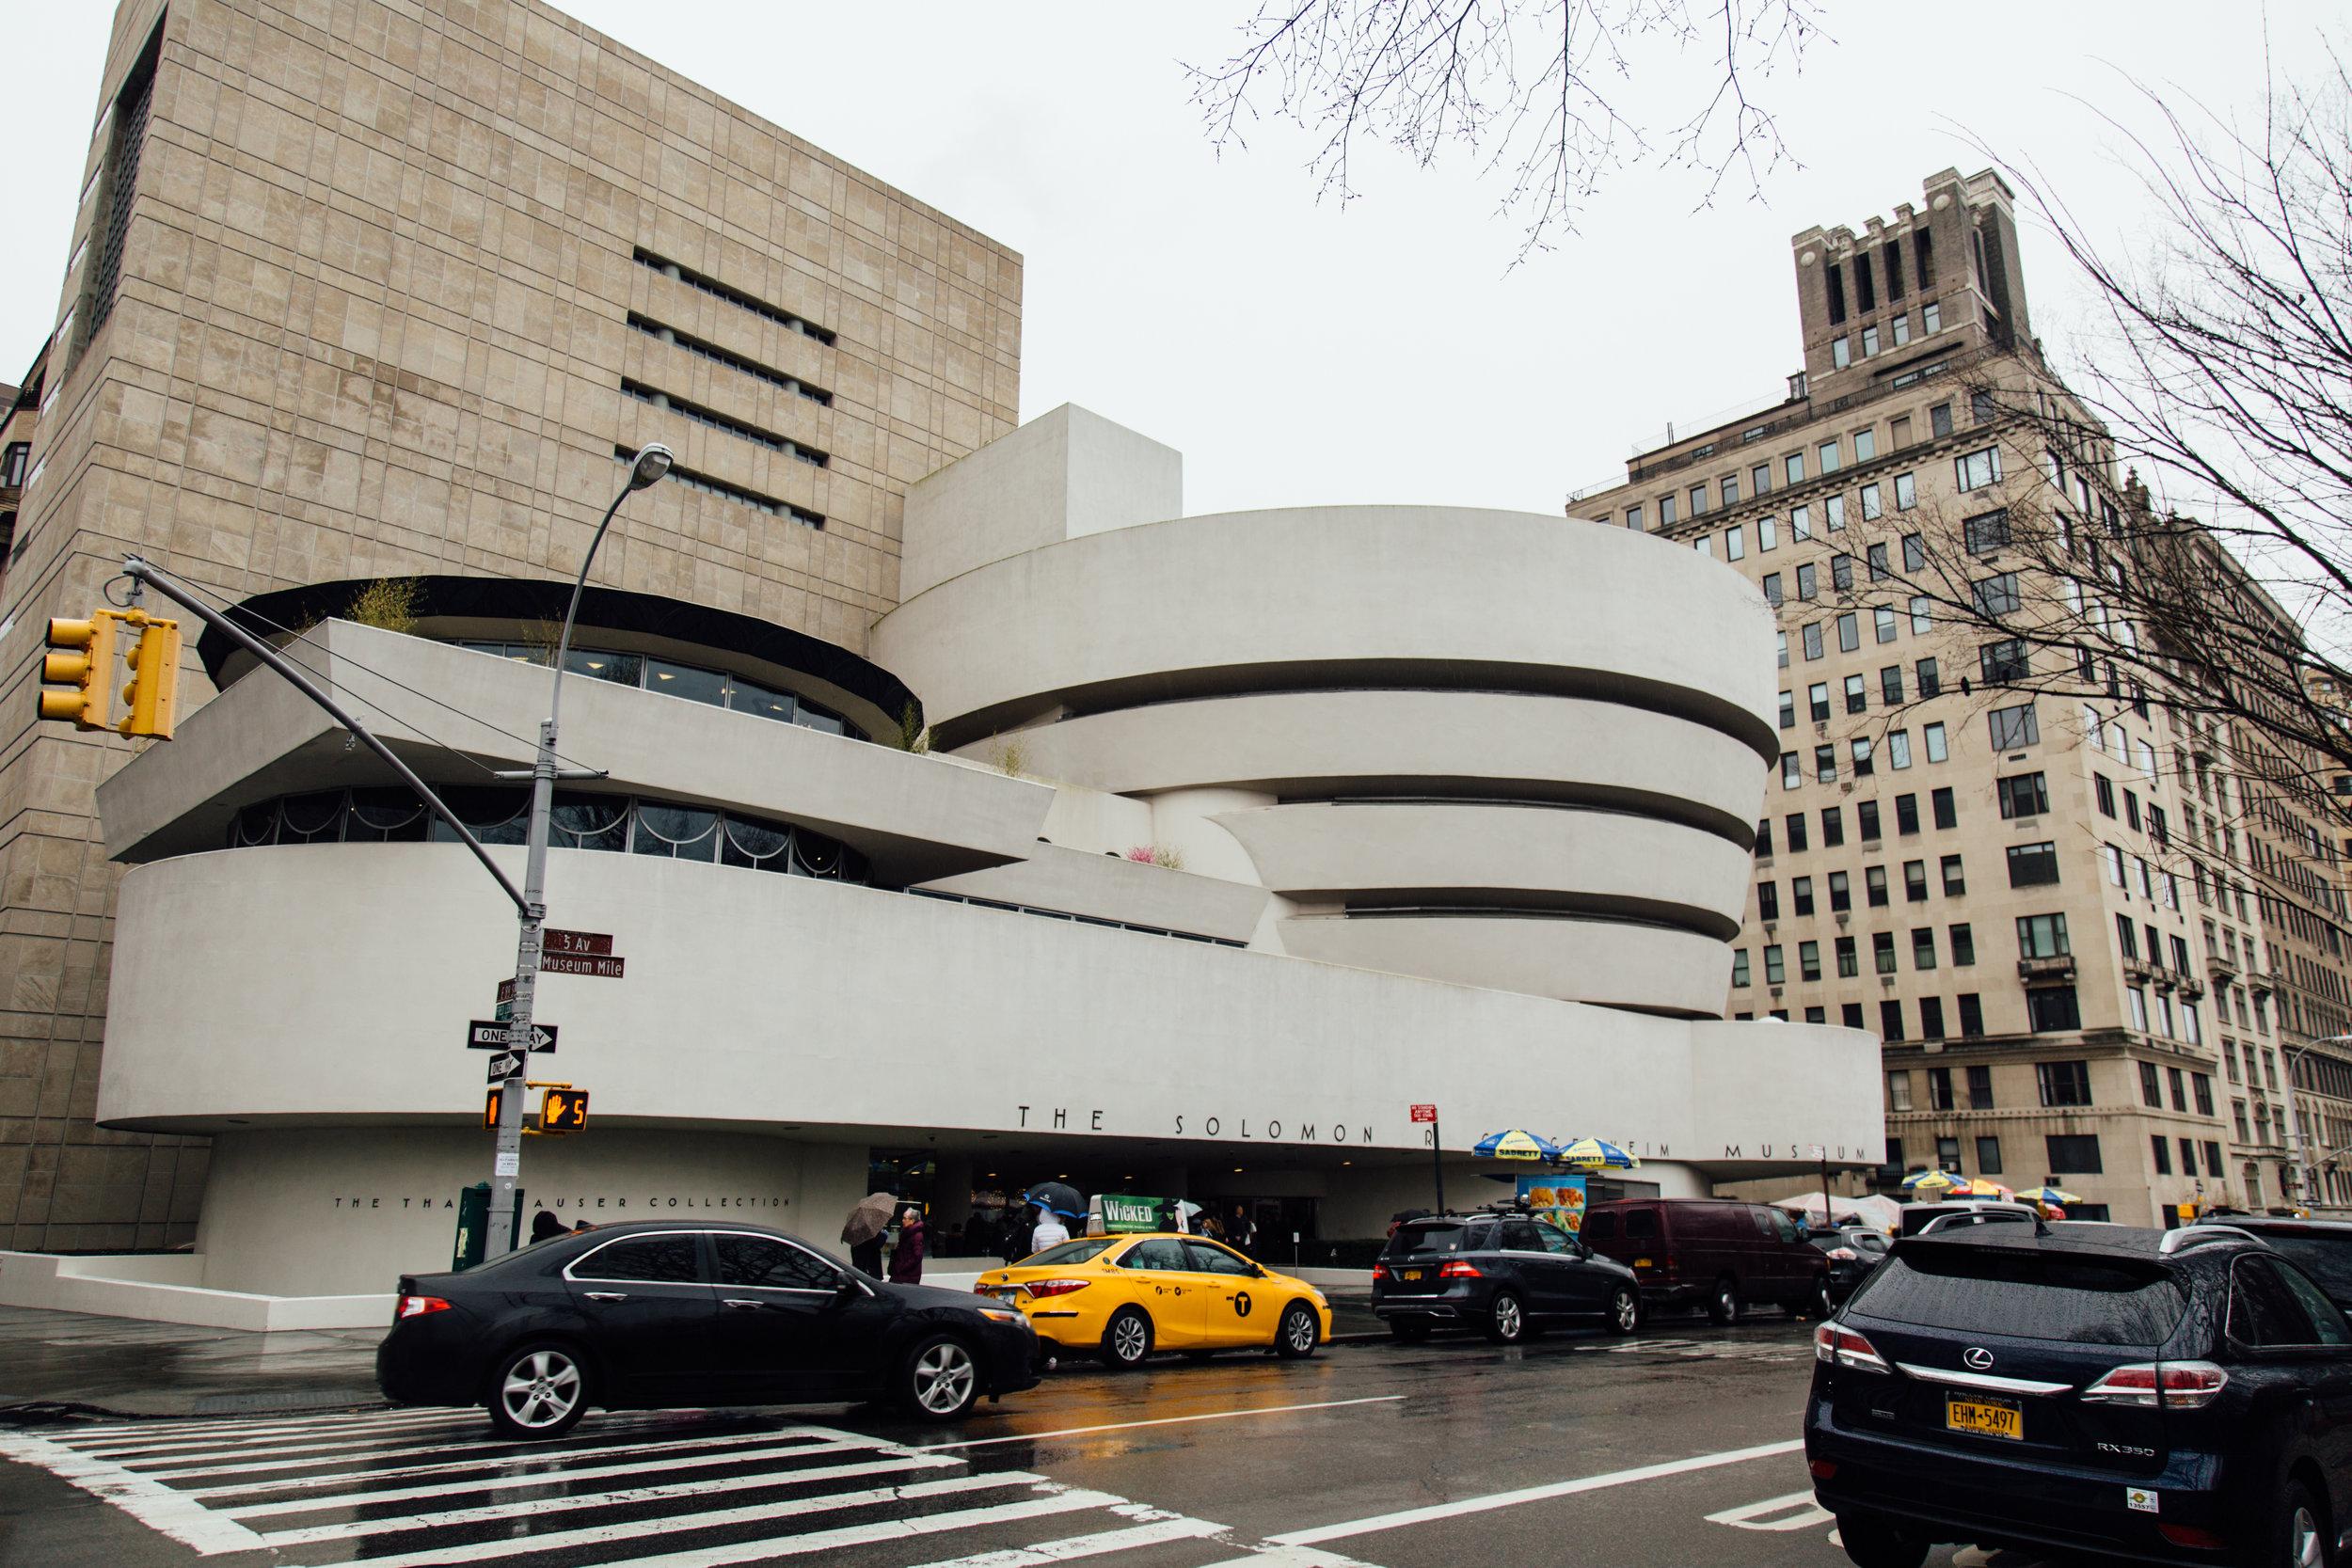 Solomon R. Guggenheim Museum designed by Frank Lloyd Wright.